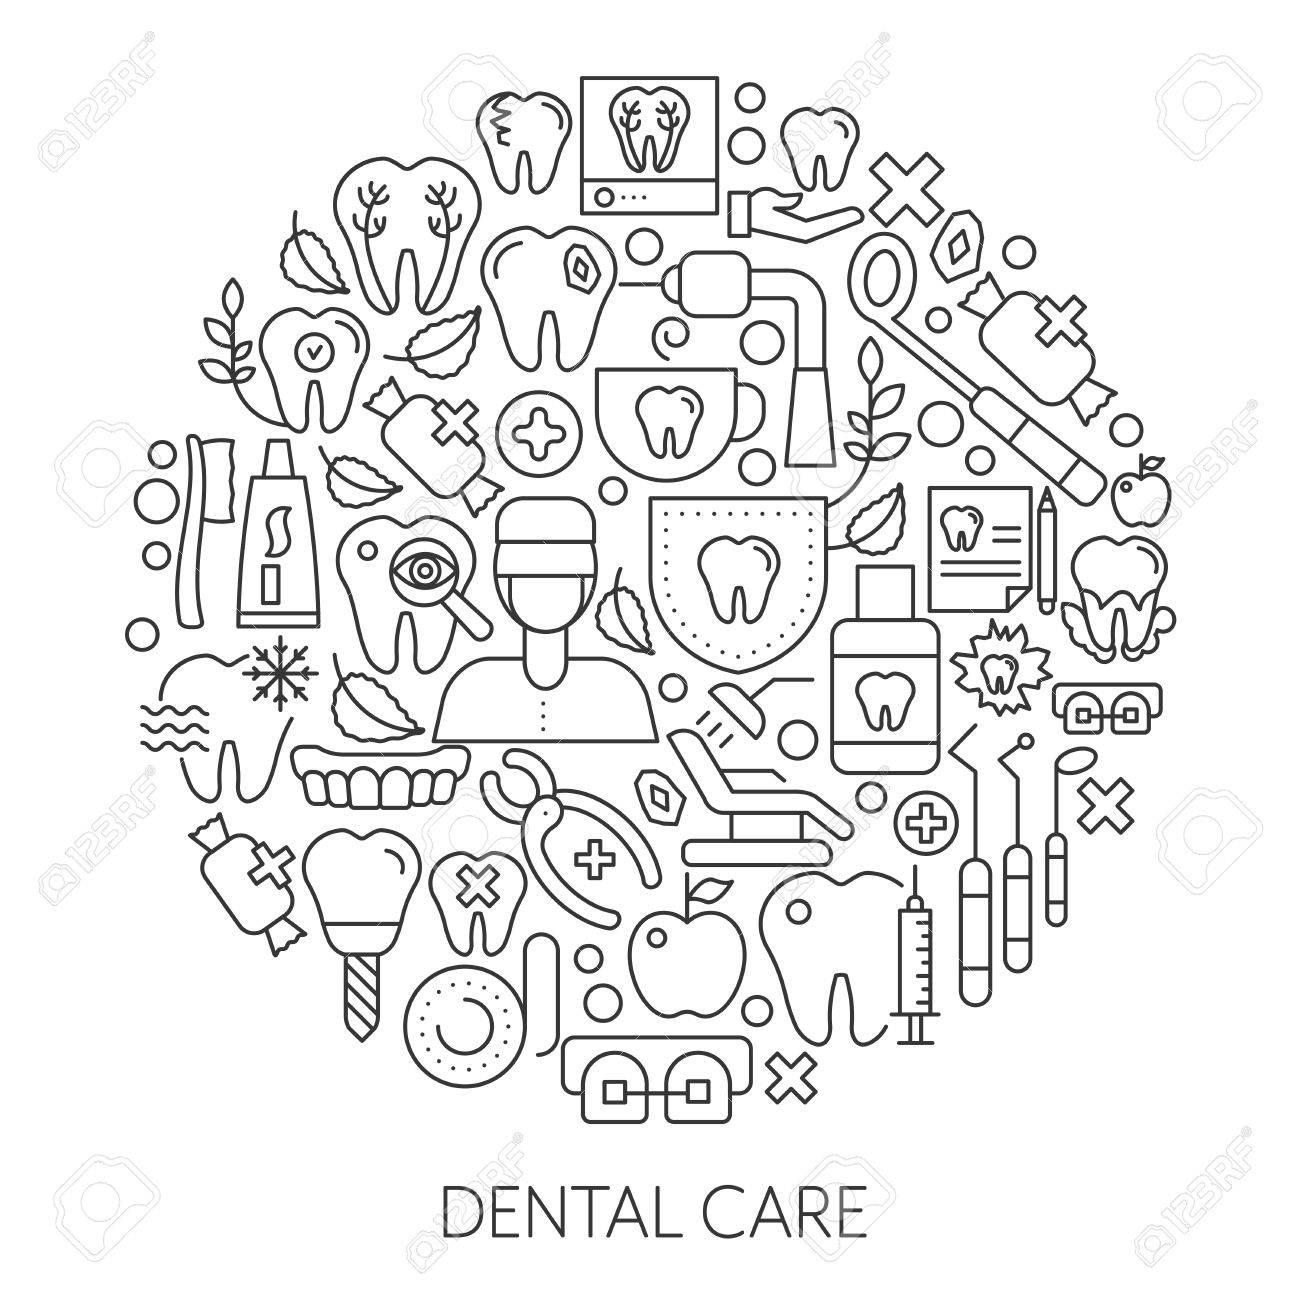 1300x1300 Dental Care Web Design Concept. Line Icons For Website And Landing